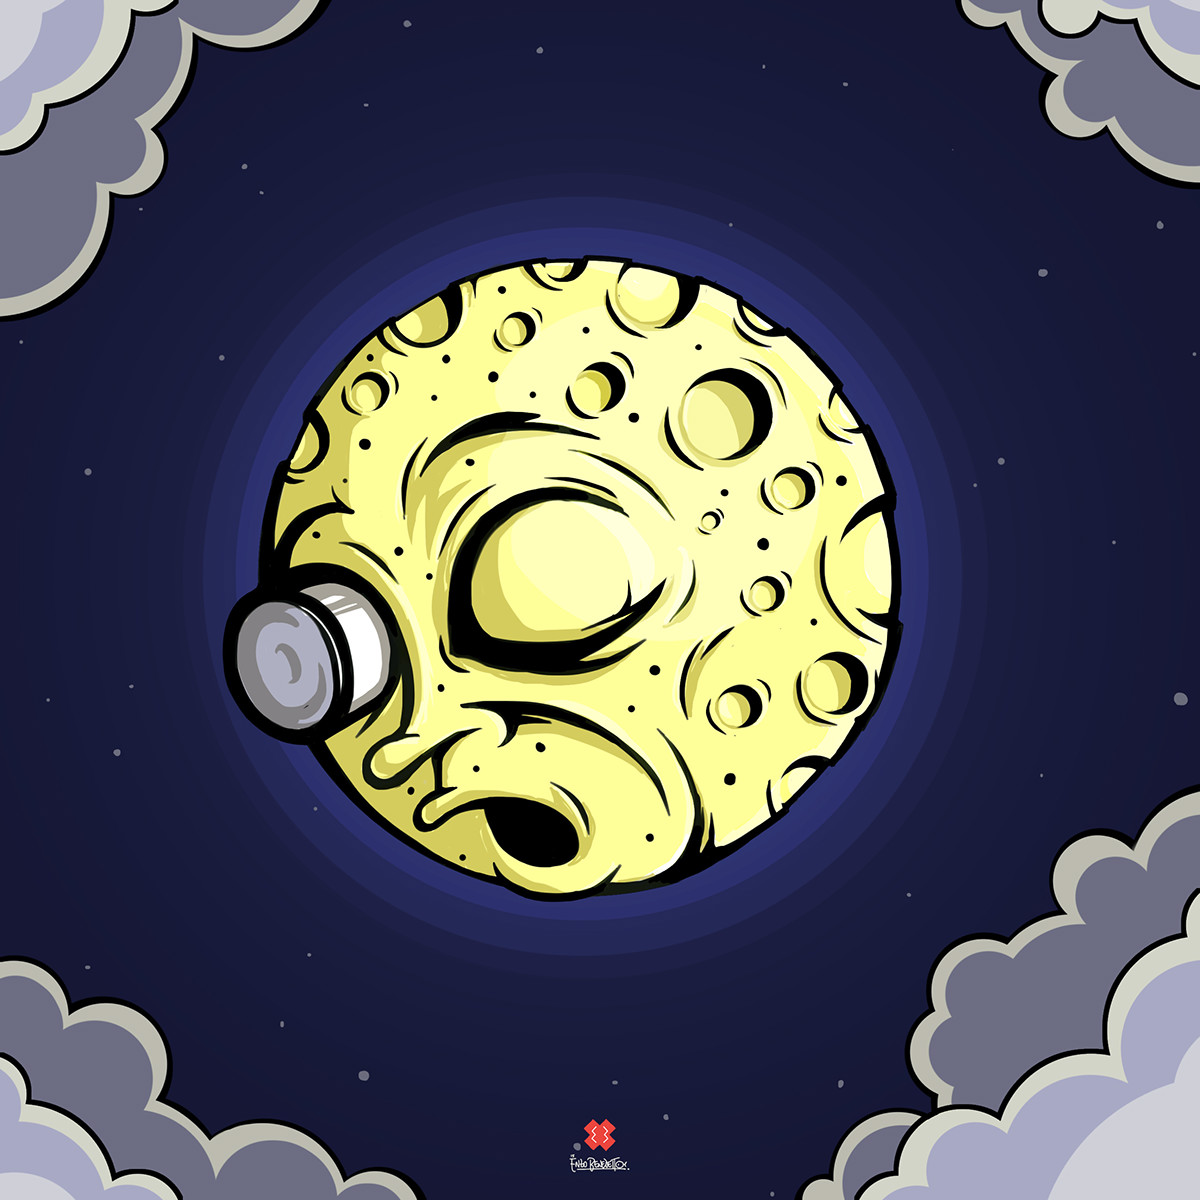 moon,voyage,luna,lune,me,georges melies,Enzo Benedetto,ROCKET MOON,notte